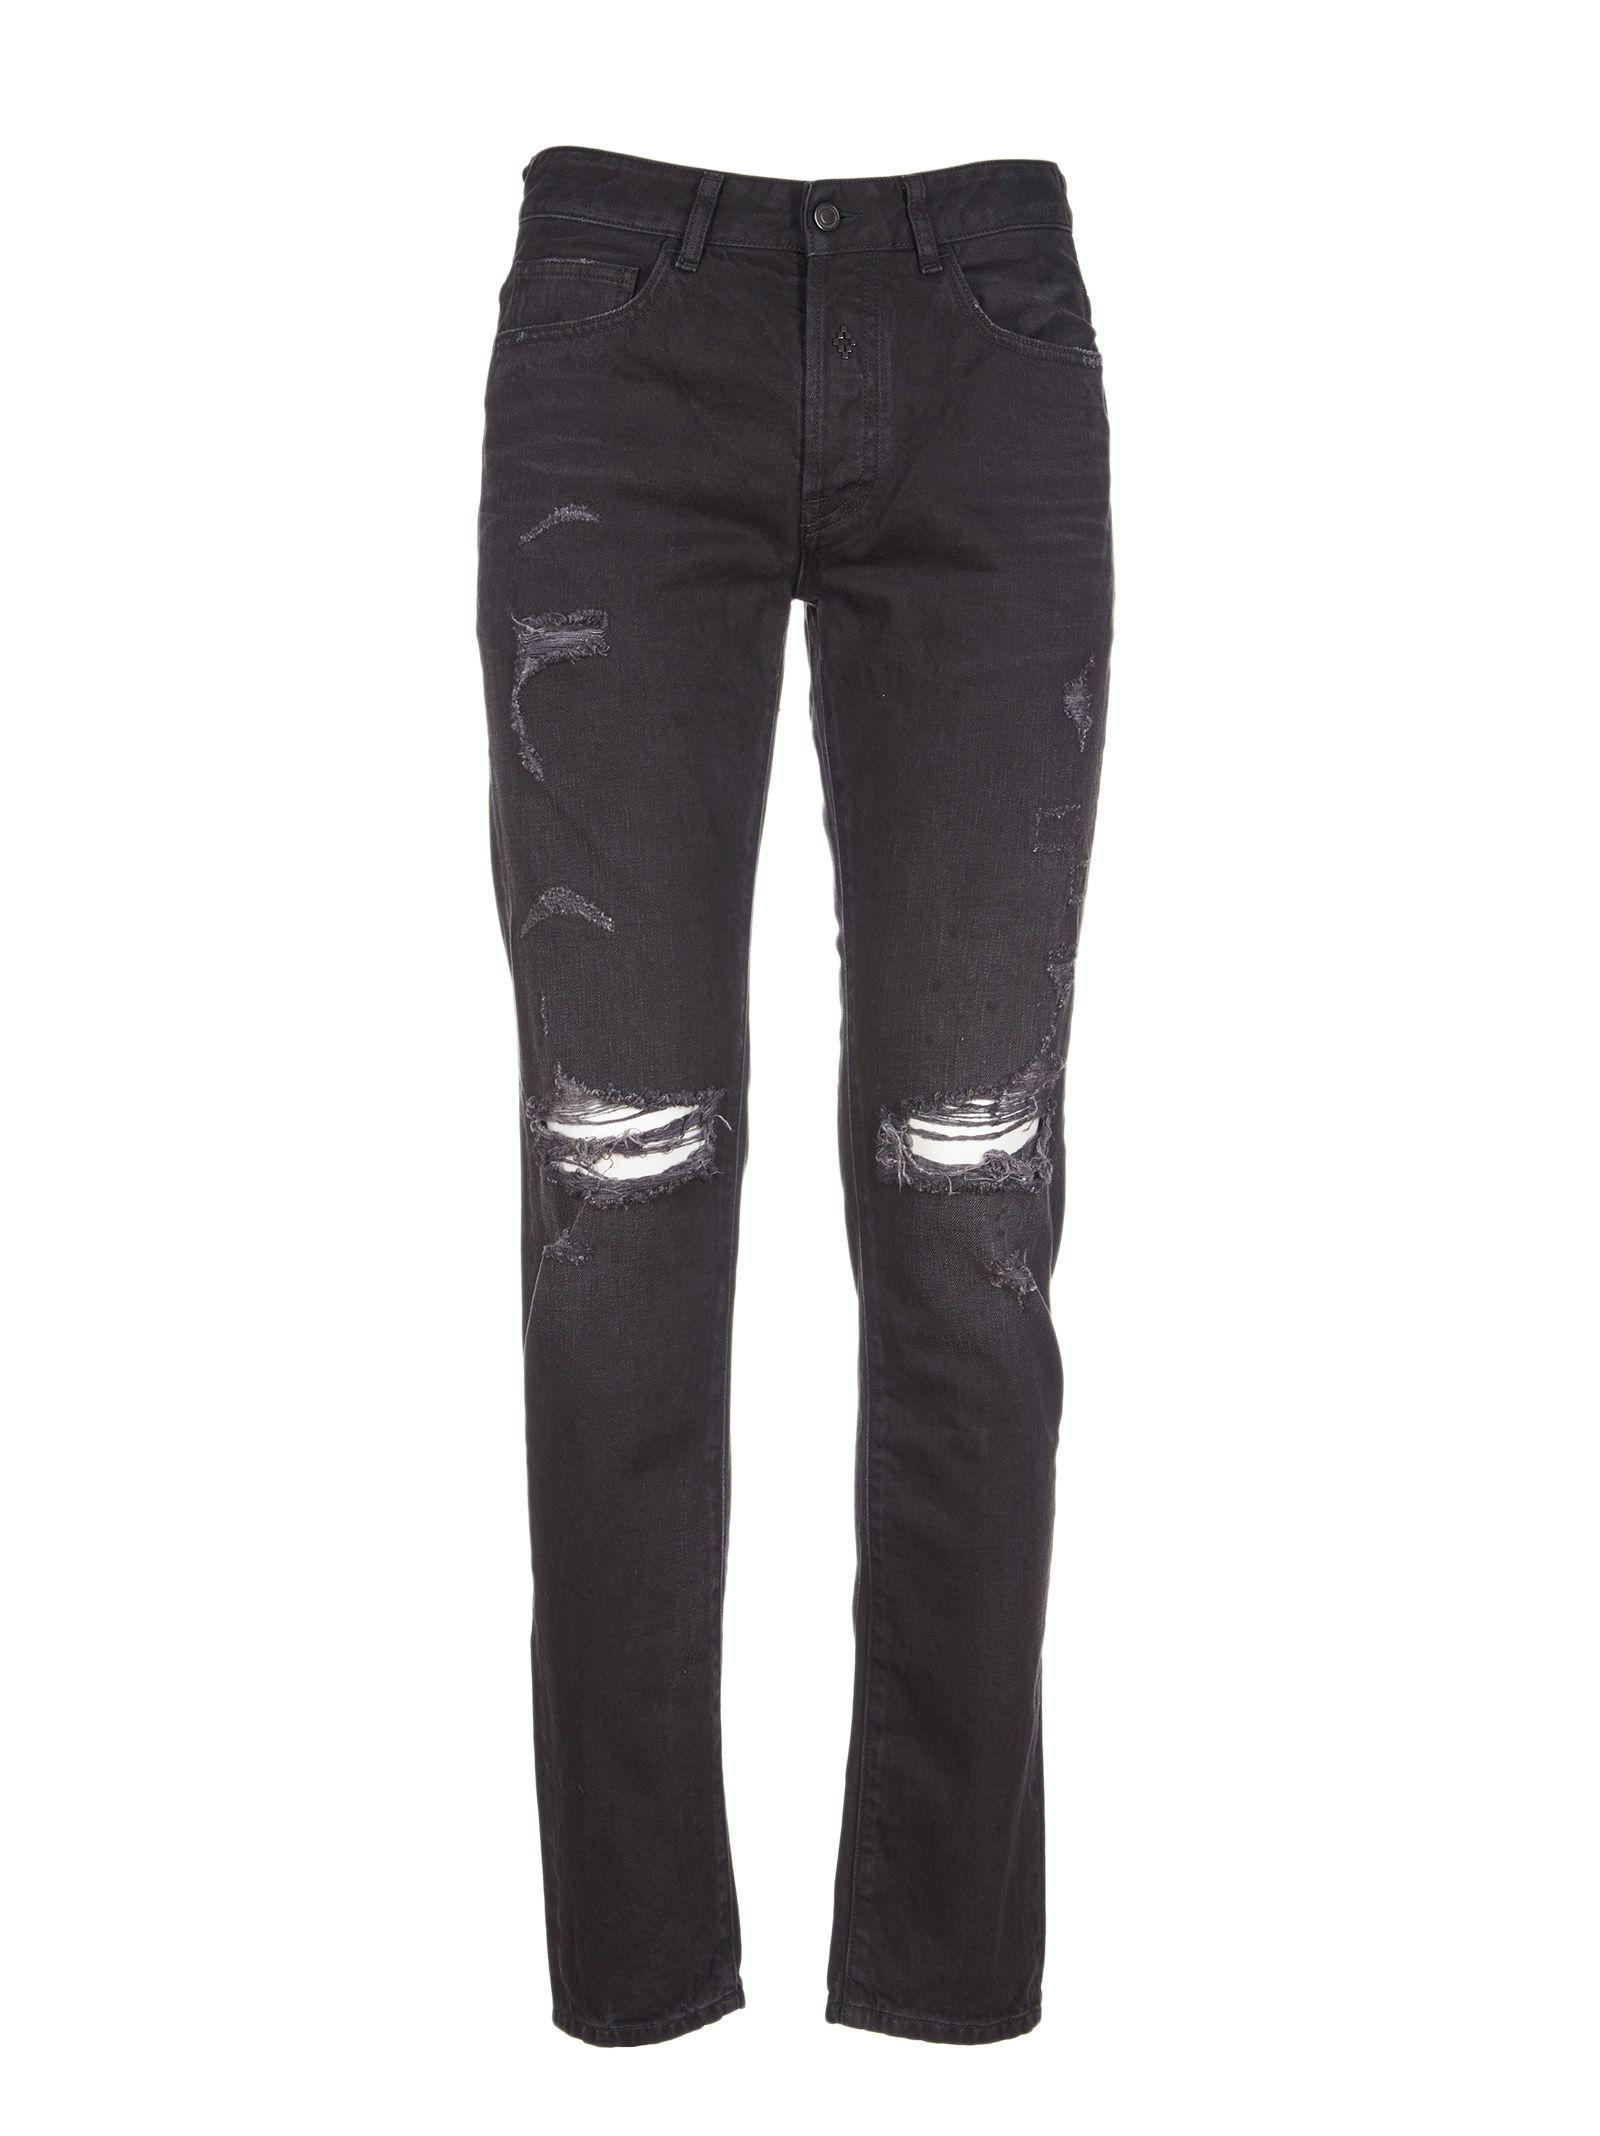 Marcelo Burlon Distressed Jeans 10537654